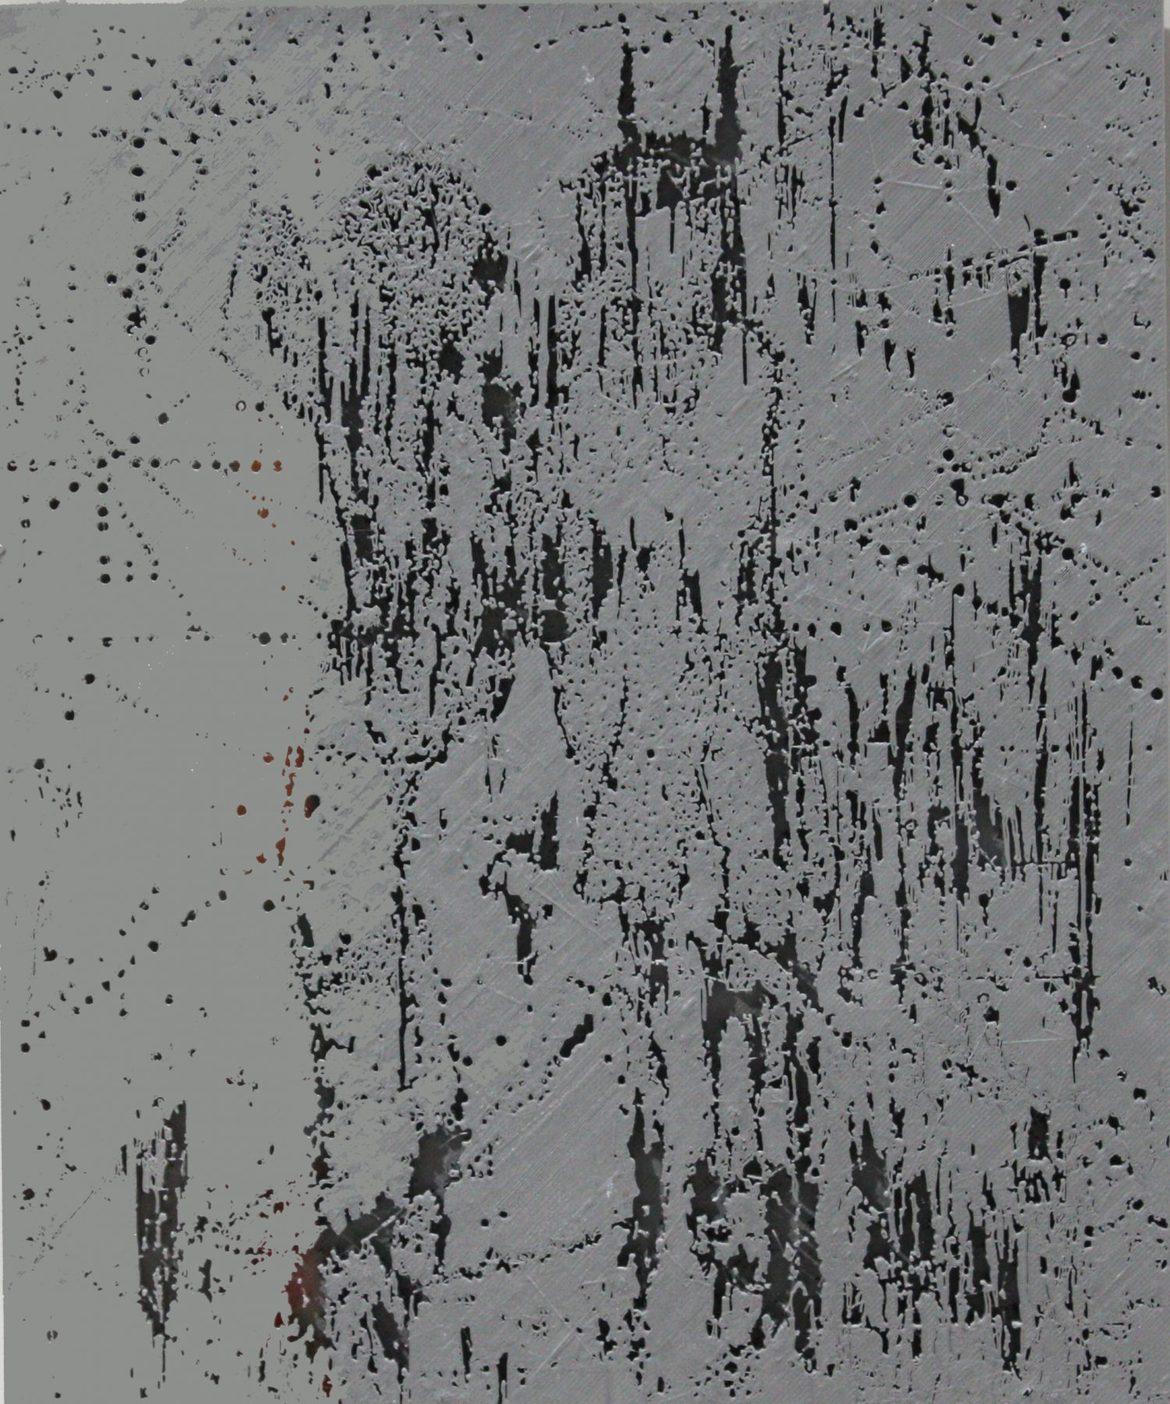 Jon Cattapan, 'Constellation Group II', 2018, 3D print, framed, 37 x 44 cm, edition of 5 + 1 A.P